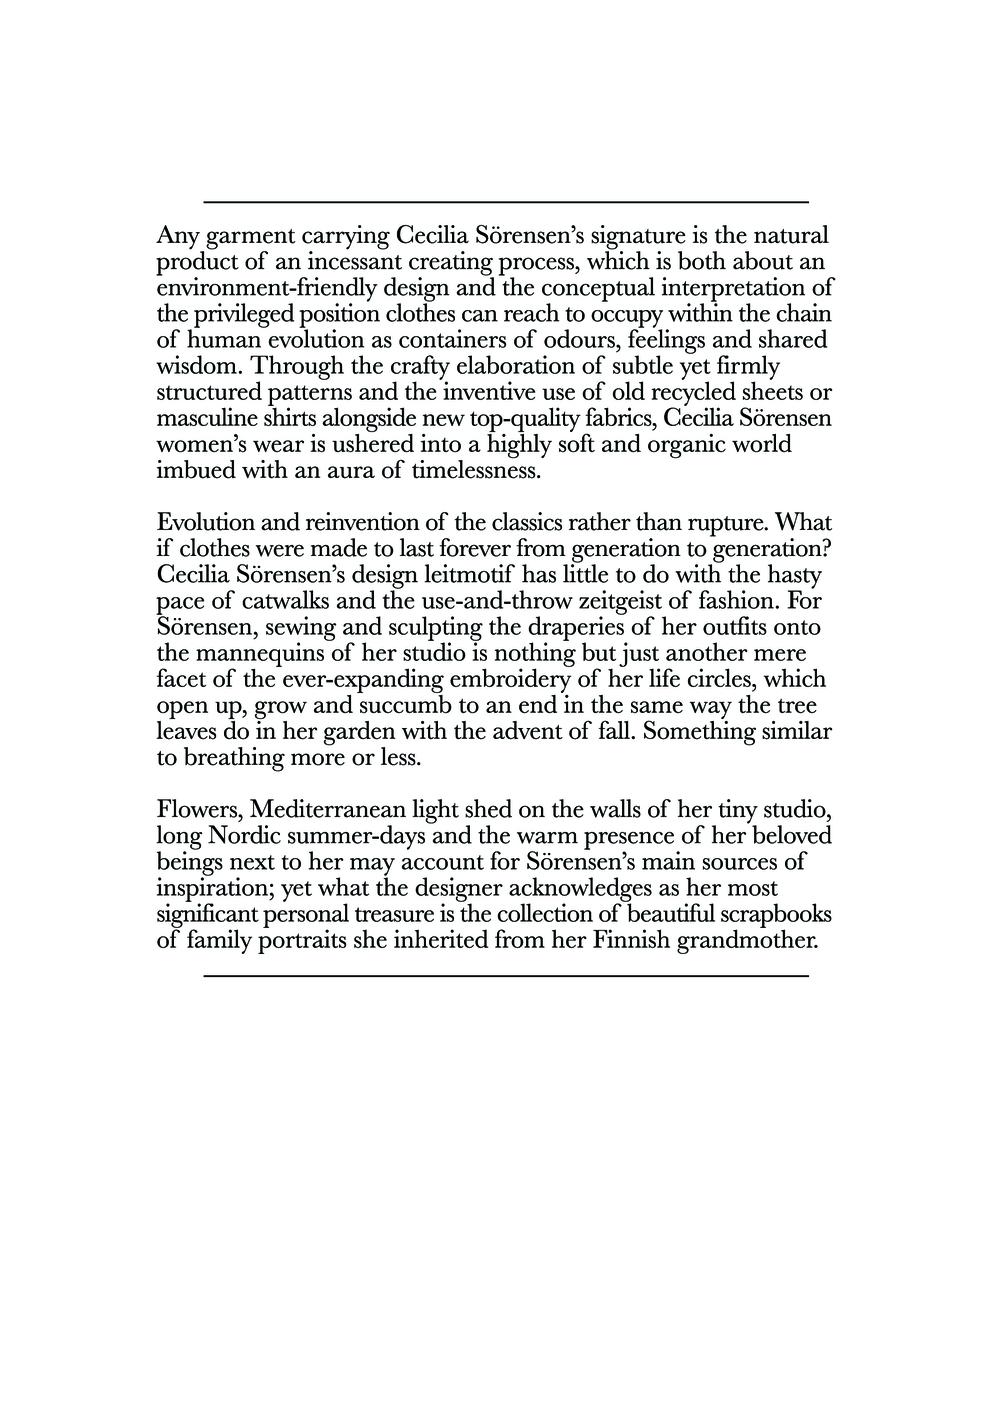 CS page 4.jpg